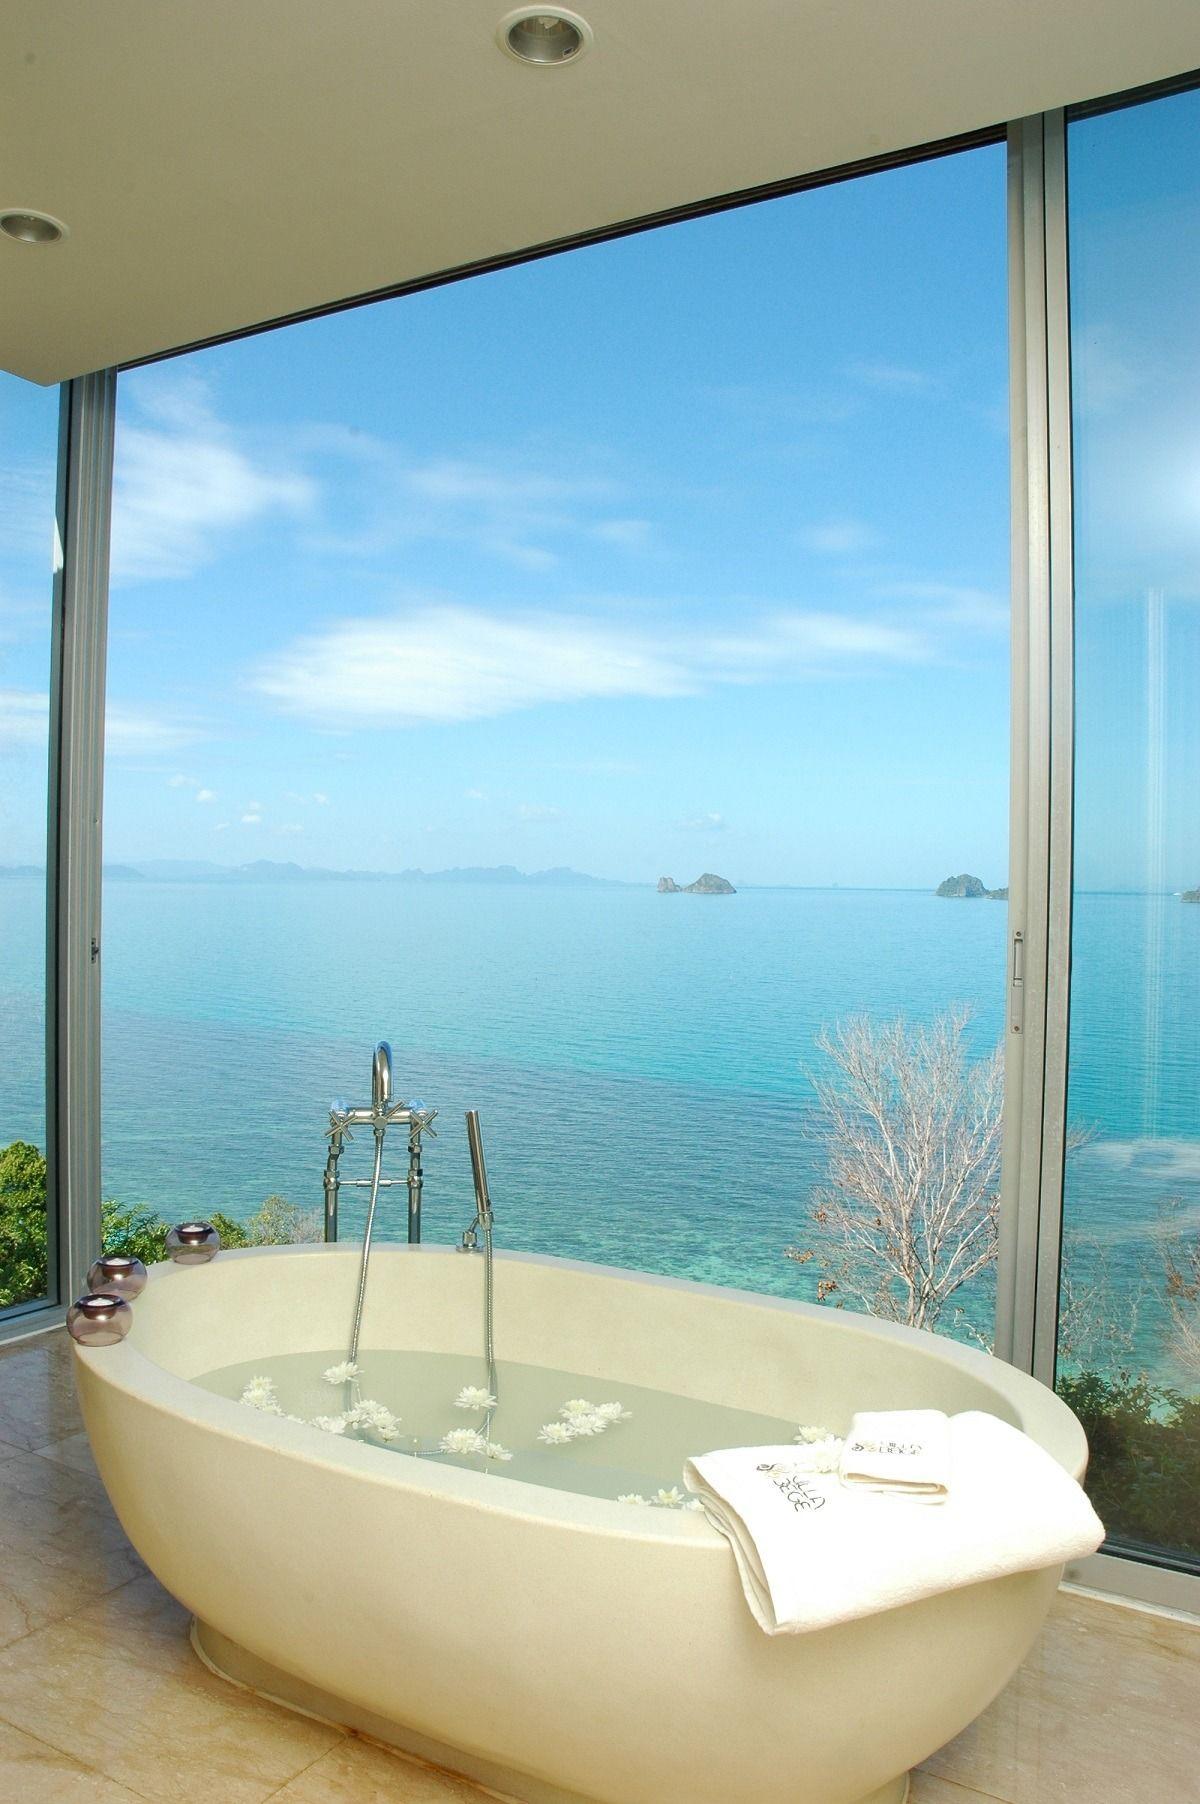 Freestanding Tub | Bathroom ideas | Pinterest | Freestanding tub and ...